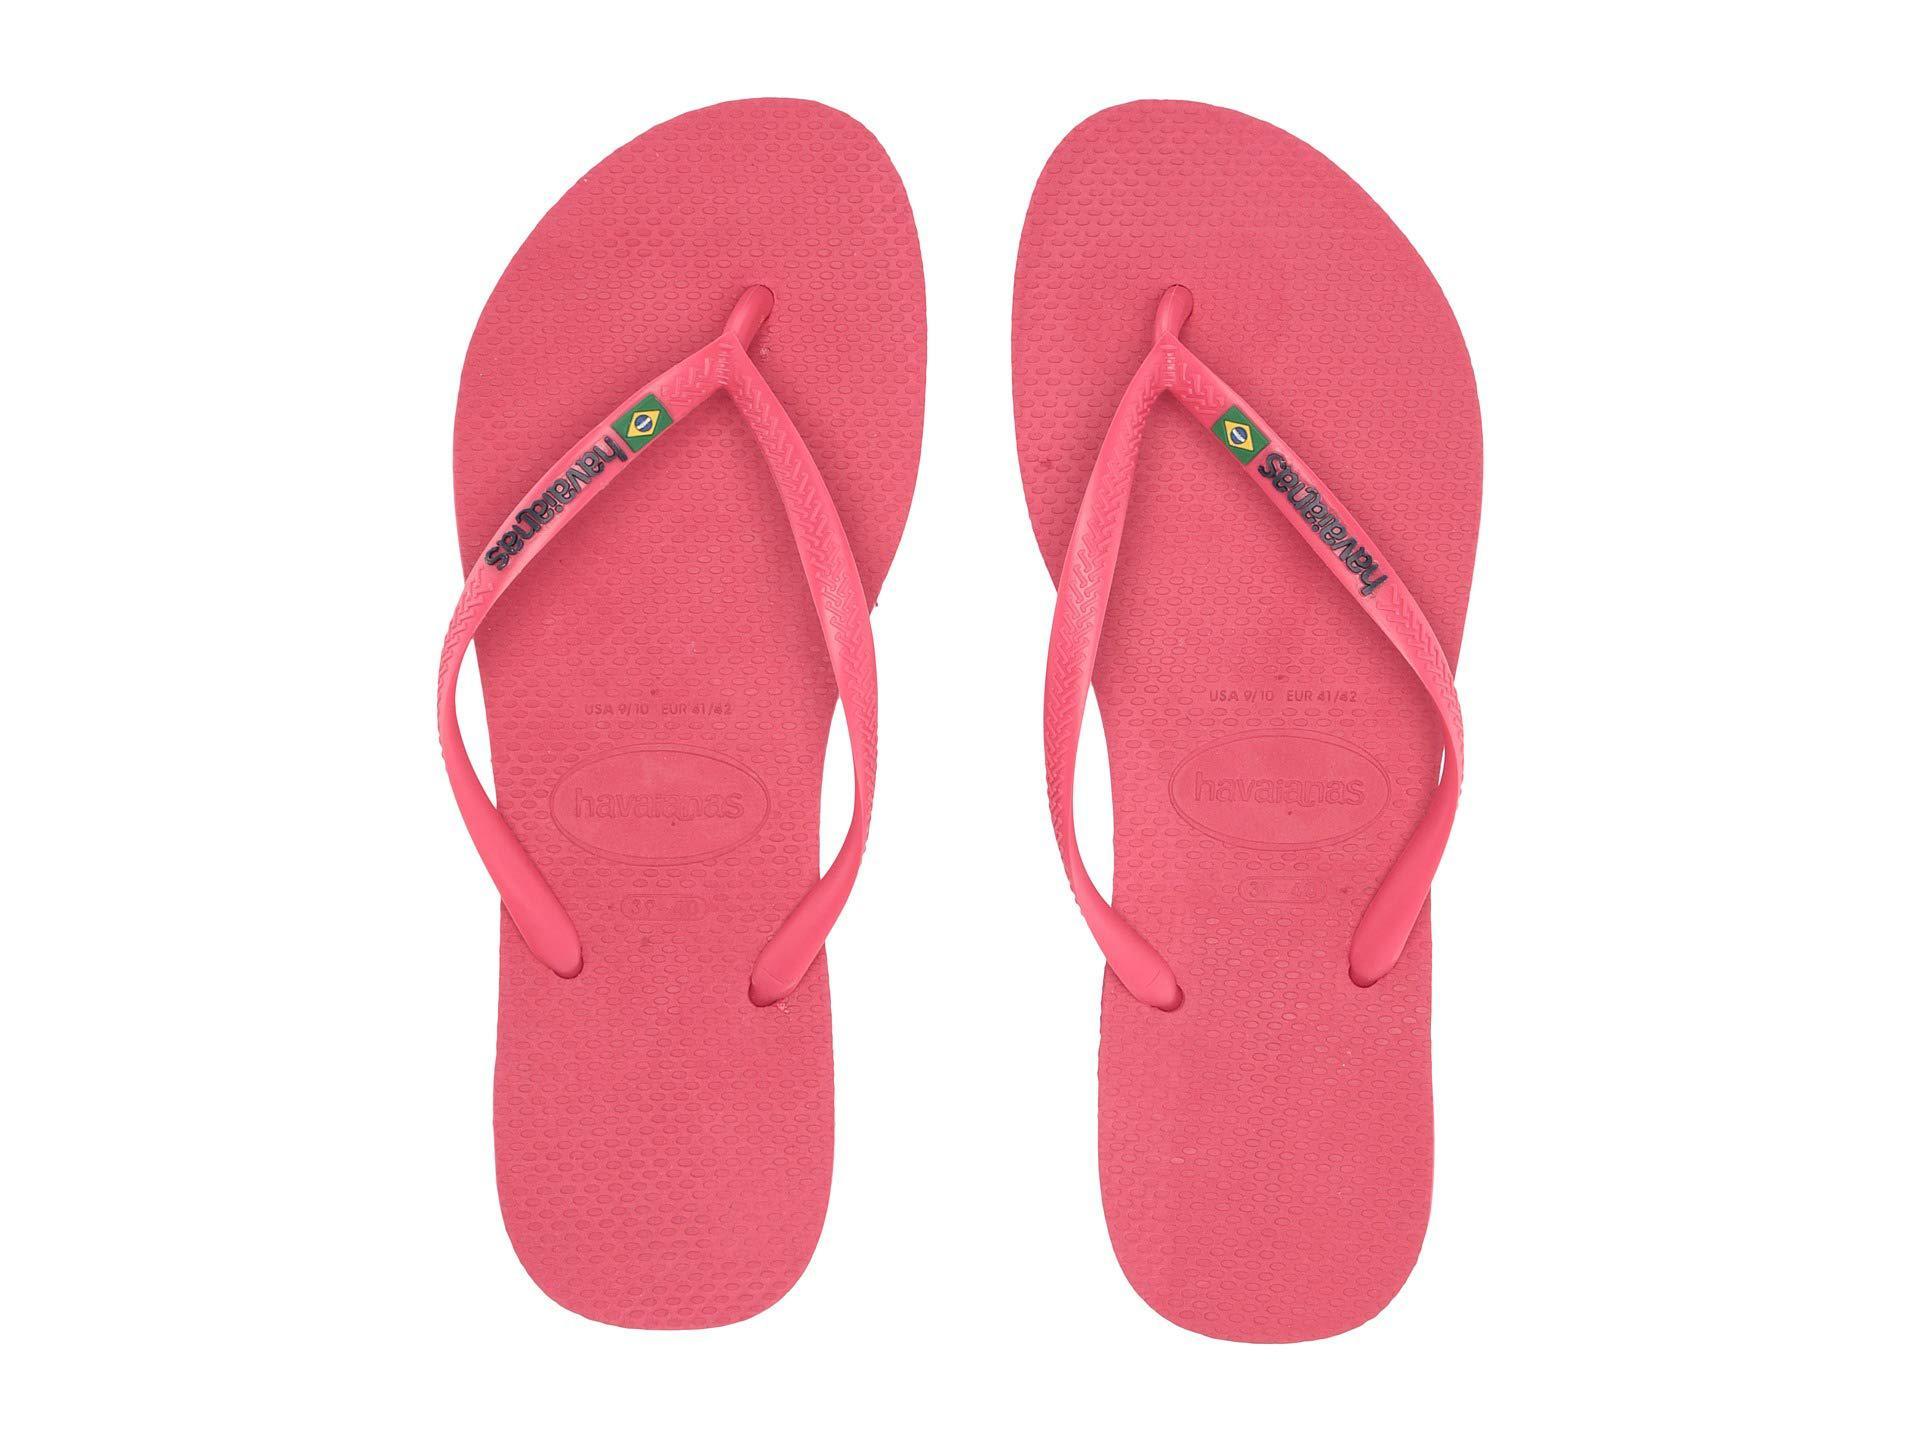 d06c5e5edf8278 Havaianas - Pink Slim Brazil Flip-flops (flamingo) Women s Sandals - Lyst.  View fullscreen